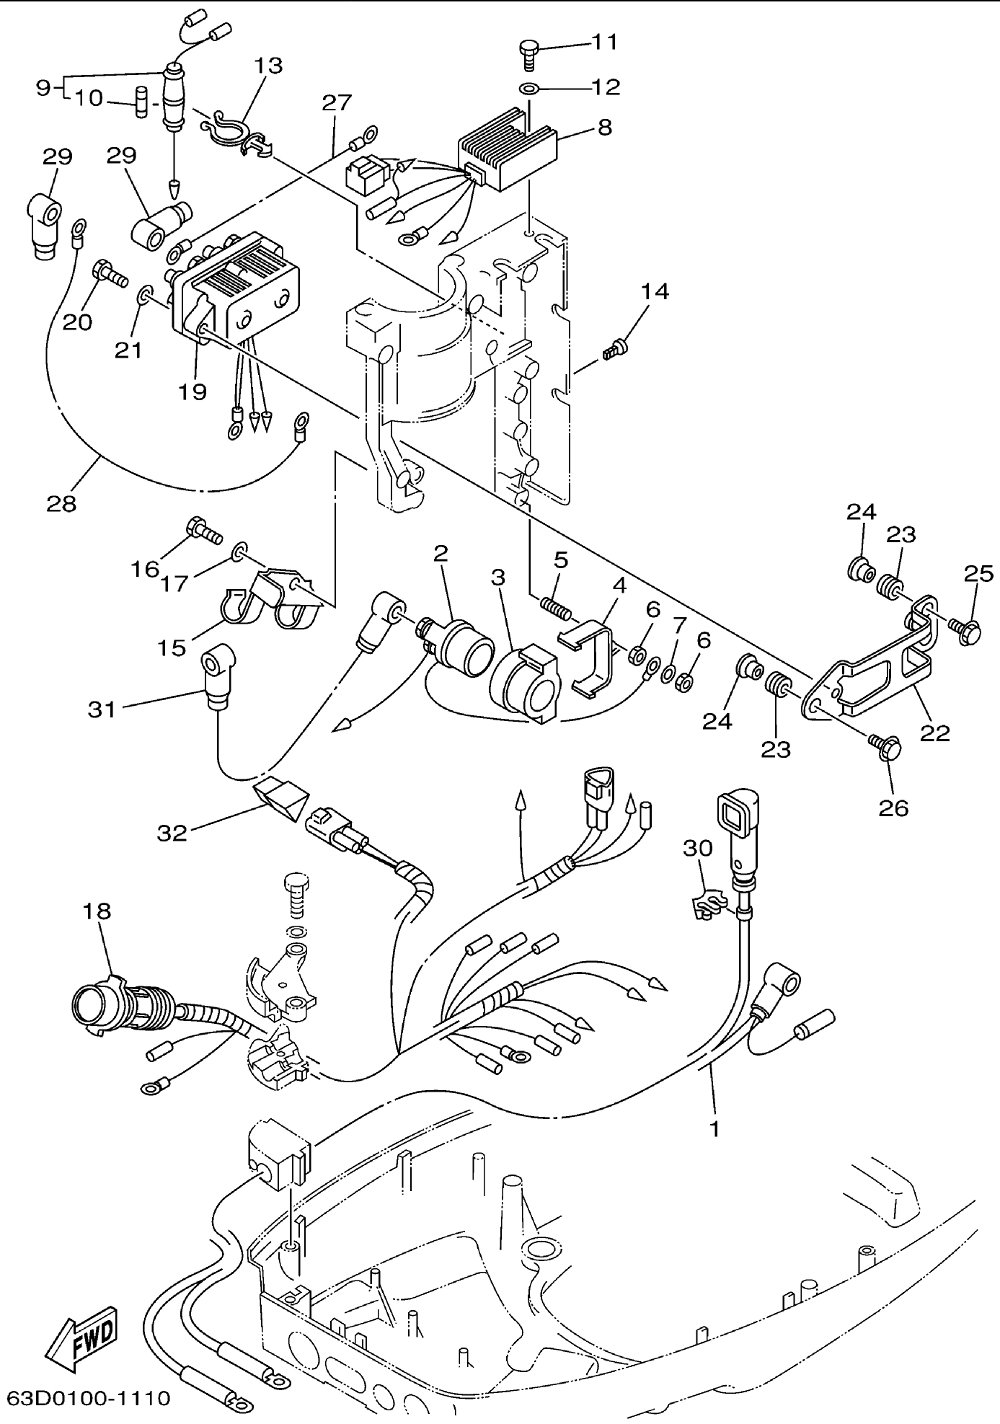 hight resolution of tilt relay 40 hp evinrude wiring diagram